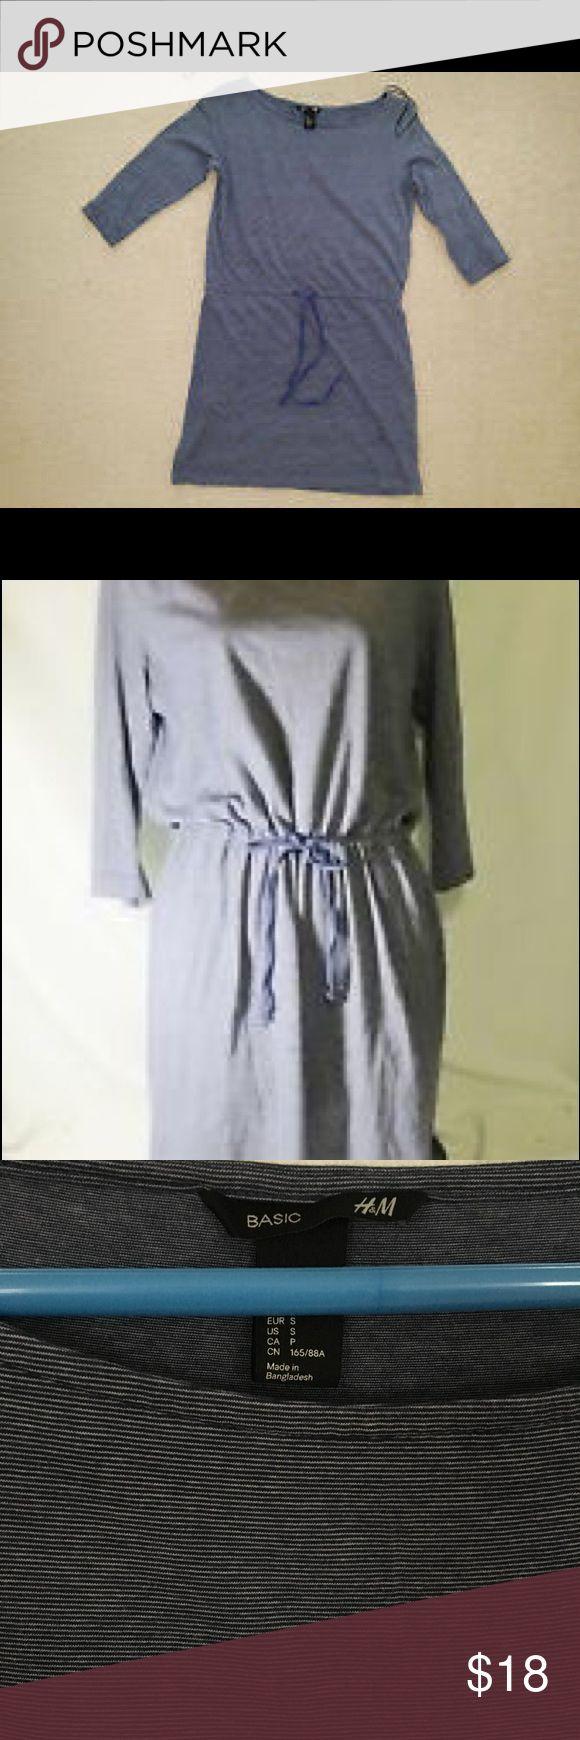 Blue & white striped mini dress with drawstring Soft cotton mini dress has 3/4 sleeves & a drawstring tie rope belt. Soooo cute! Great for spring/summer/fall. Navy blue & white stripe. H&M Dresses Mini